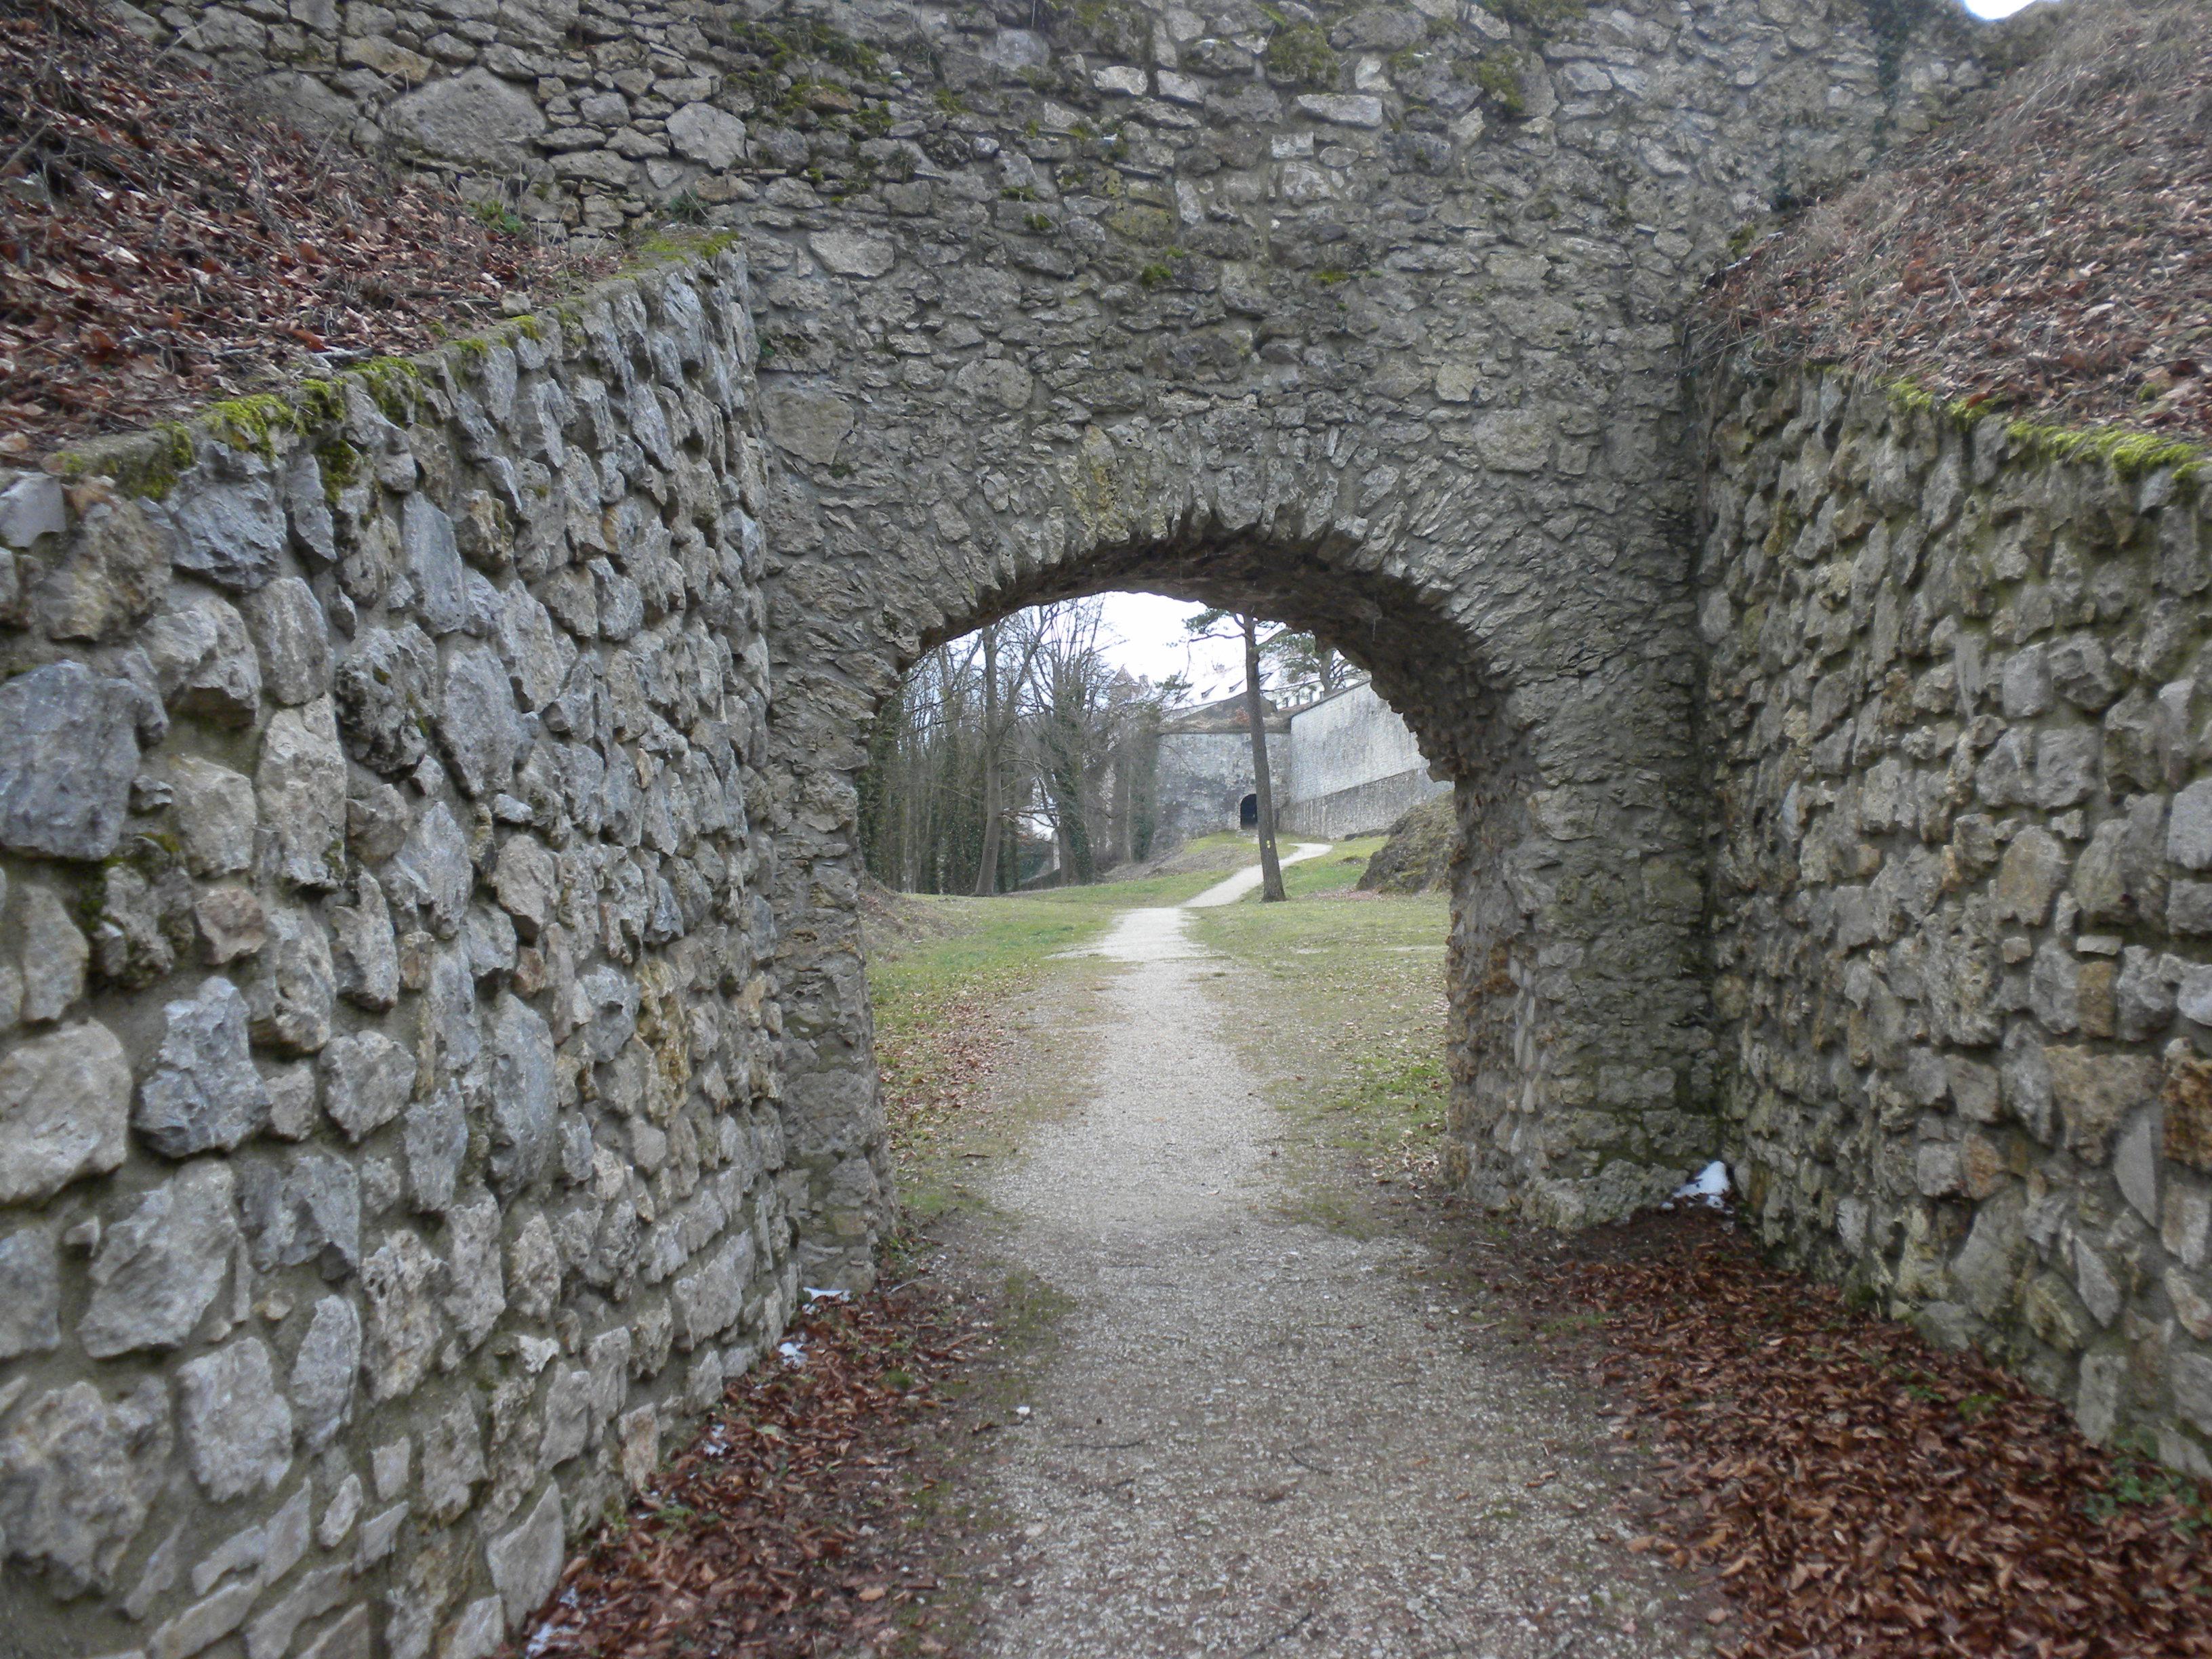 Willibaldsburg Eichstätt